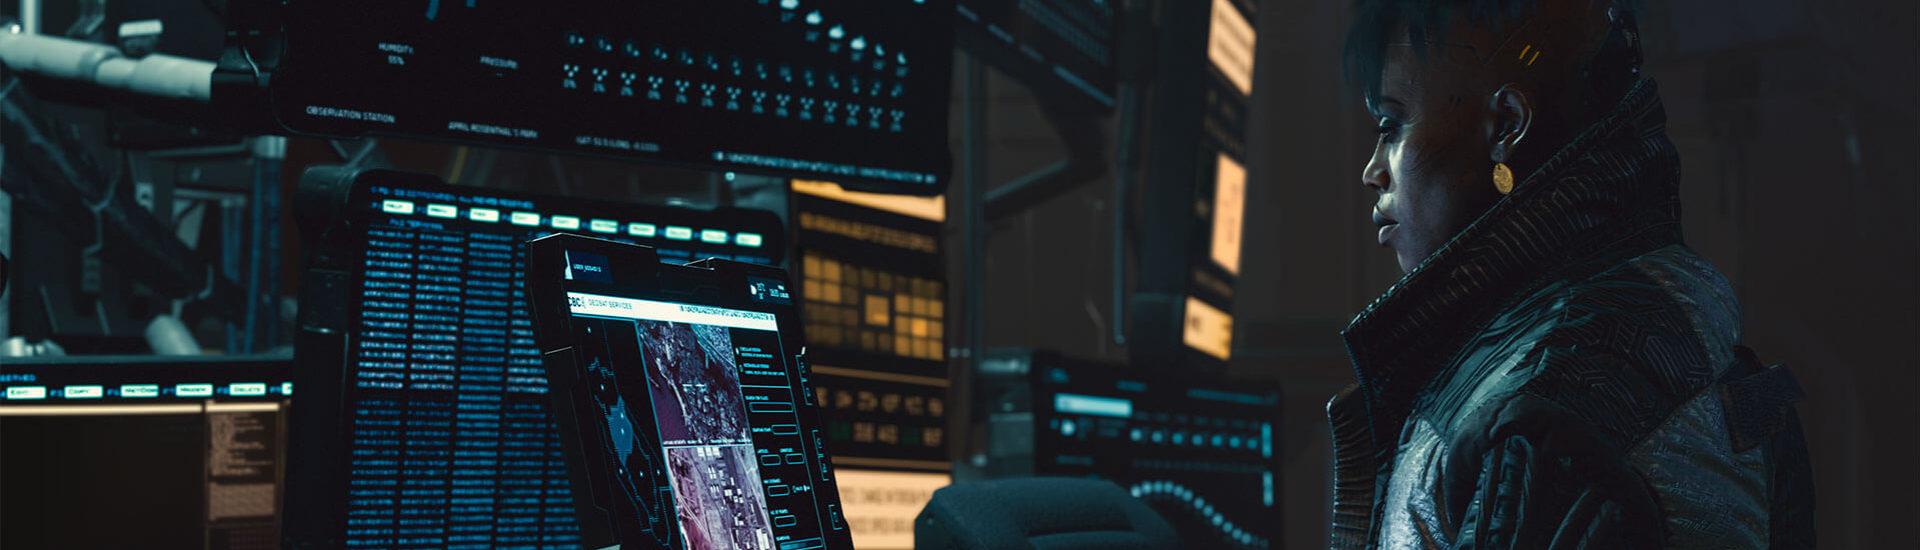 Cyberangriff auf CD Projekt Red